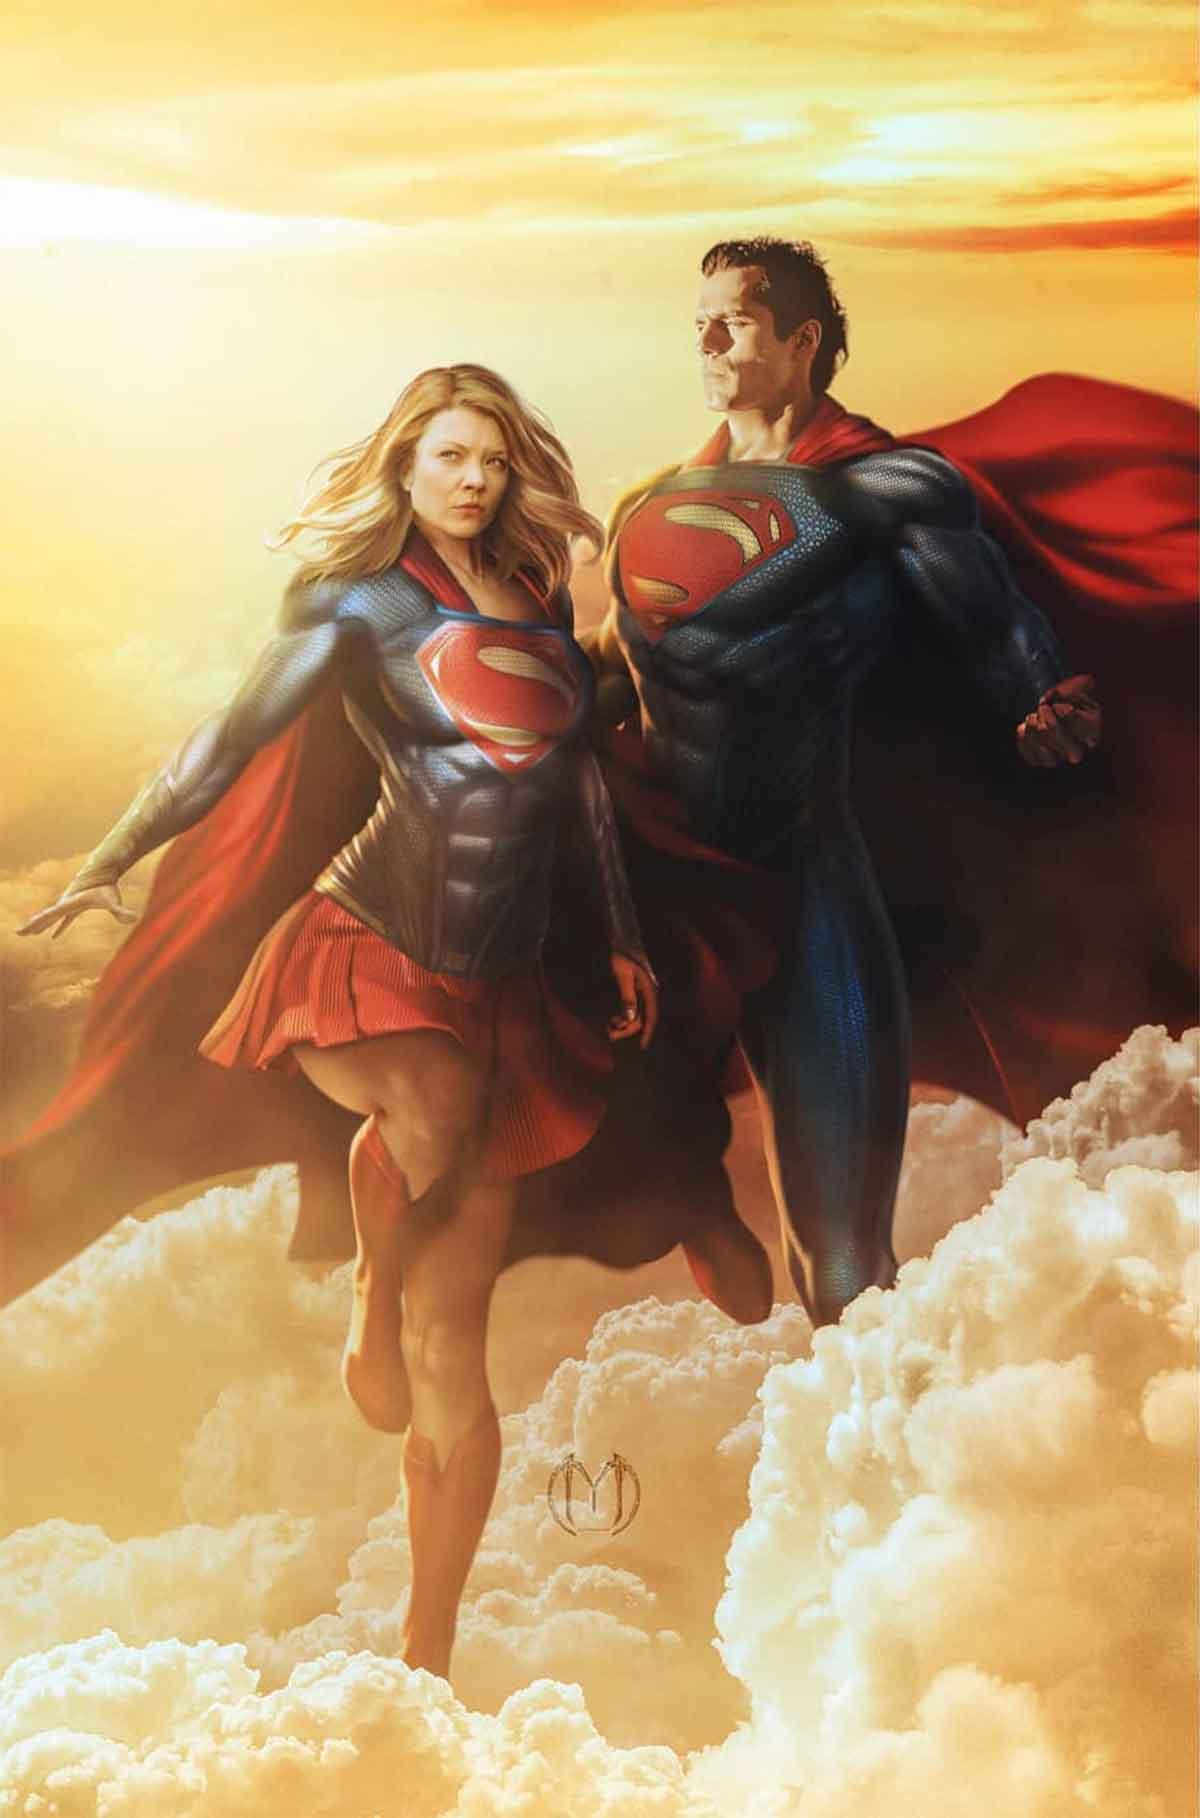 Espectacular Fan Art de Natalie Dormer como Supergirl